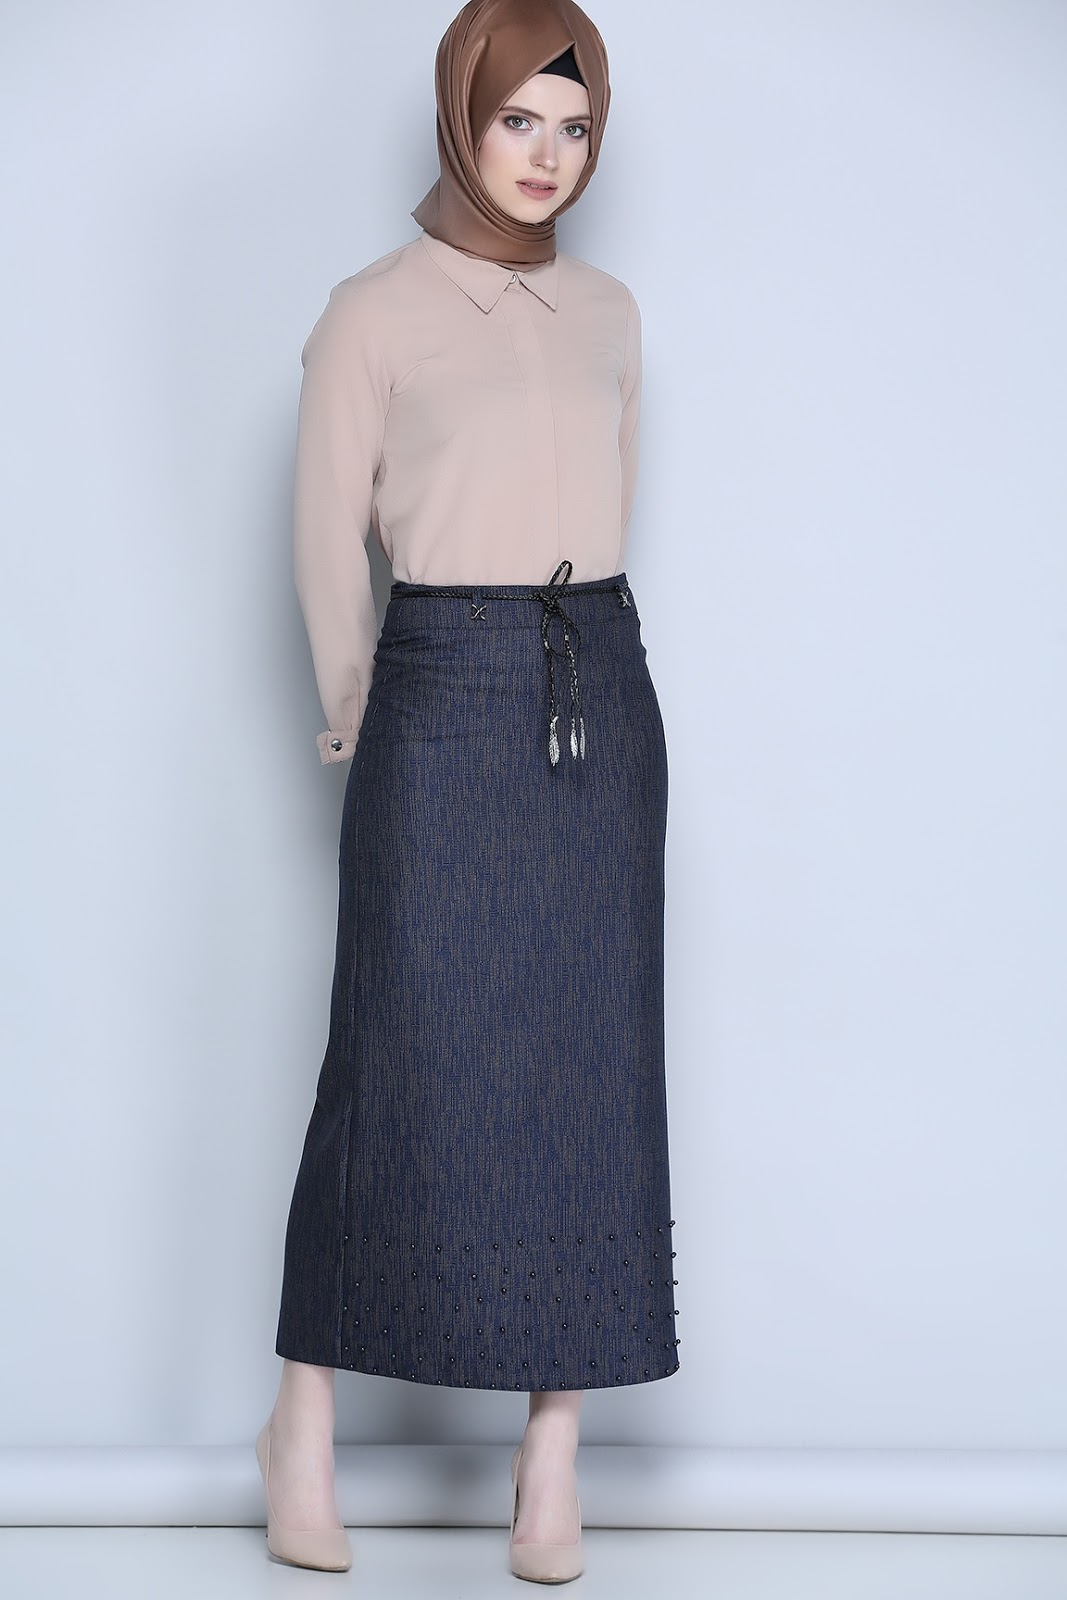 Robe longue chic ete 2018